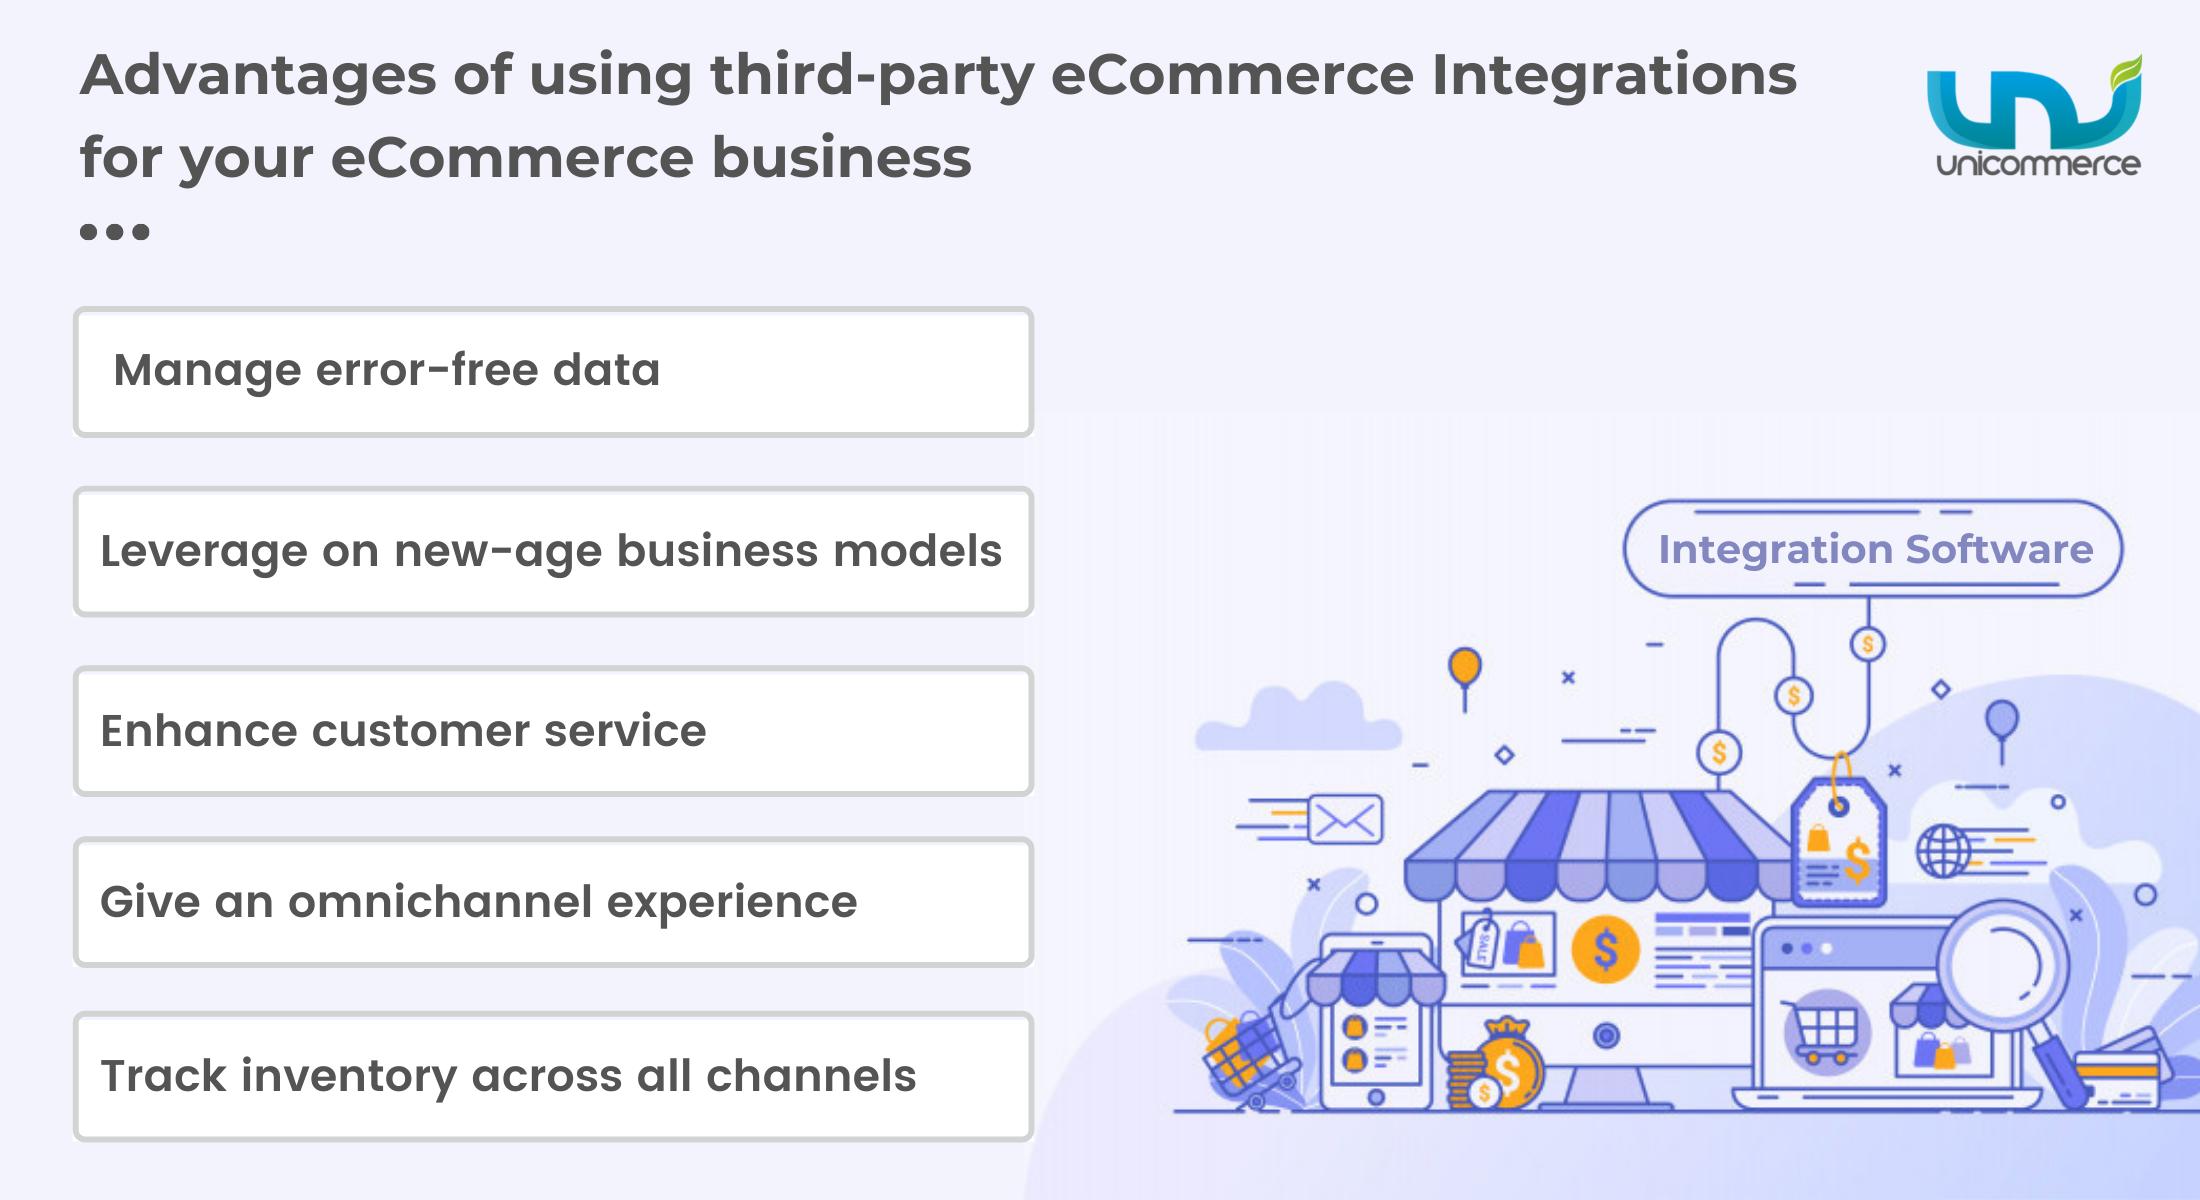 third party ecommerce integrations advantages